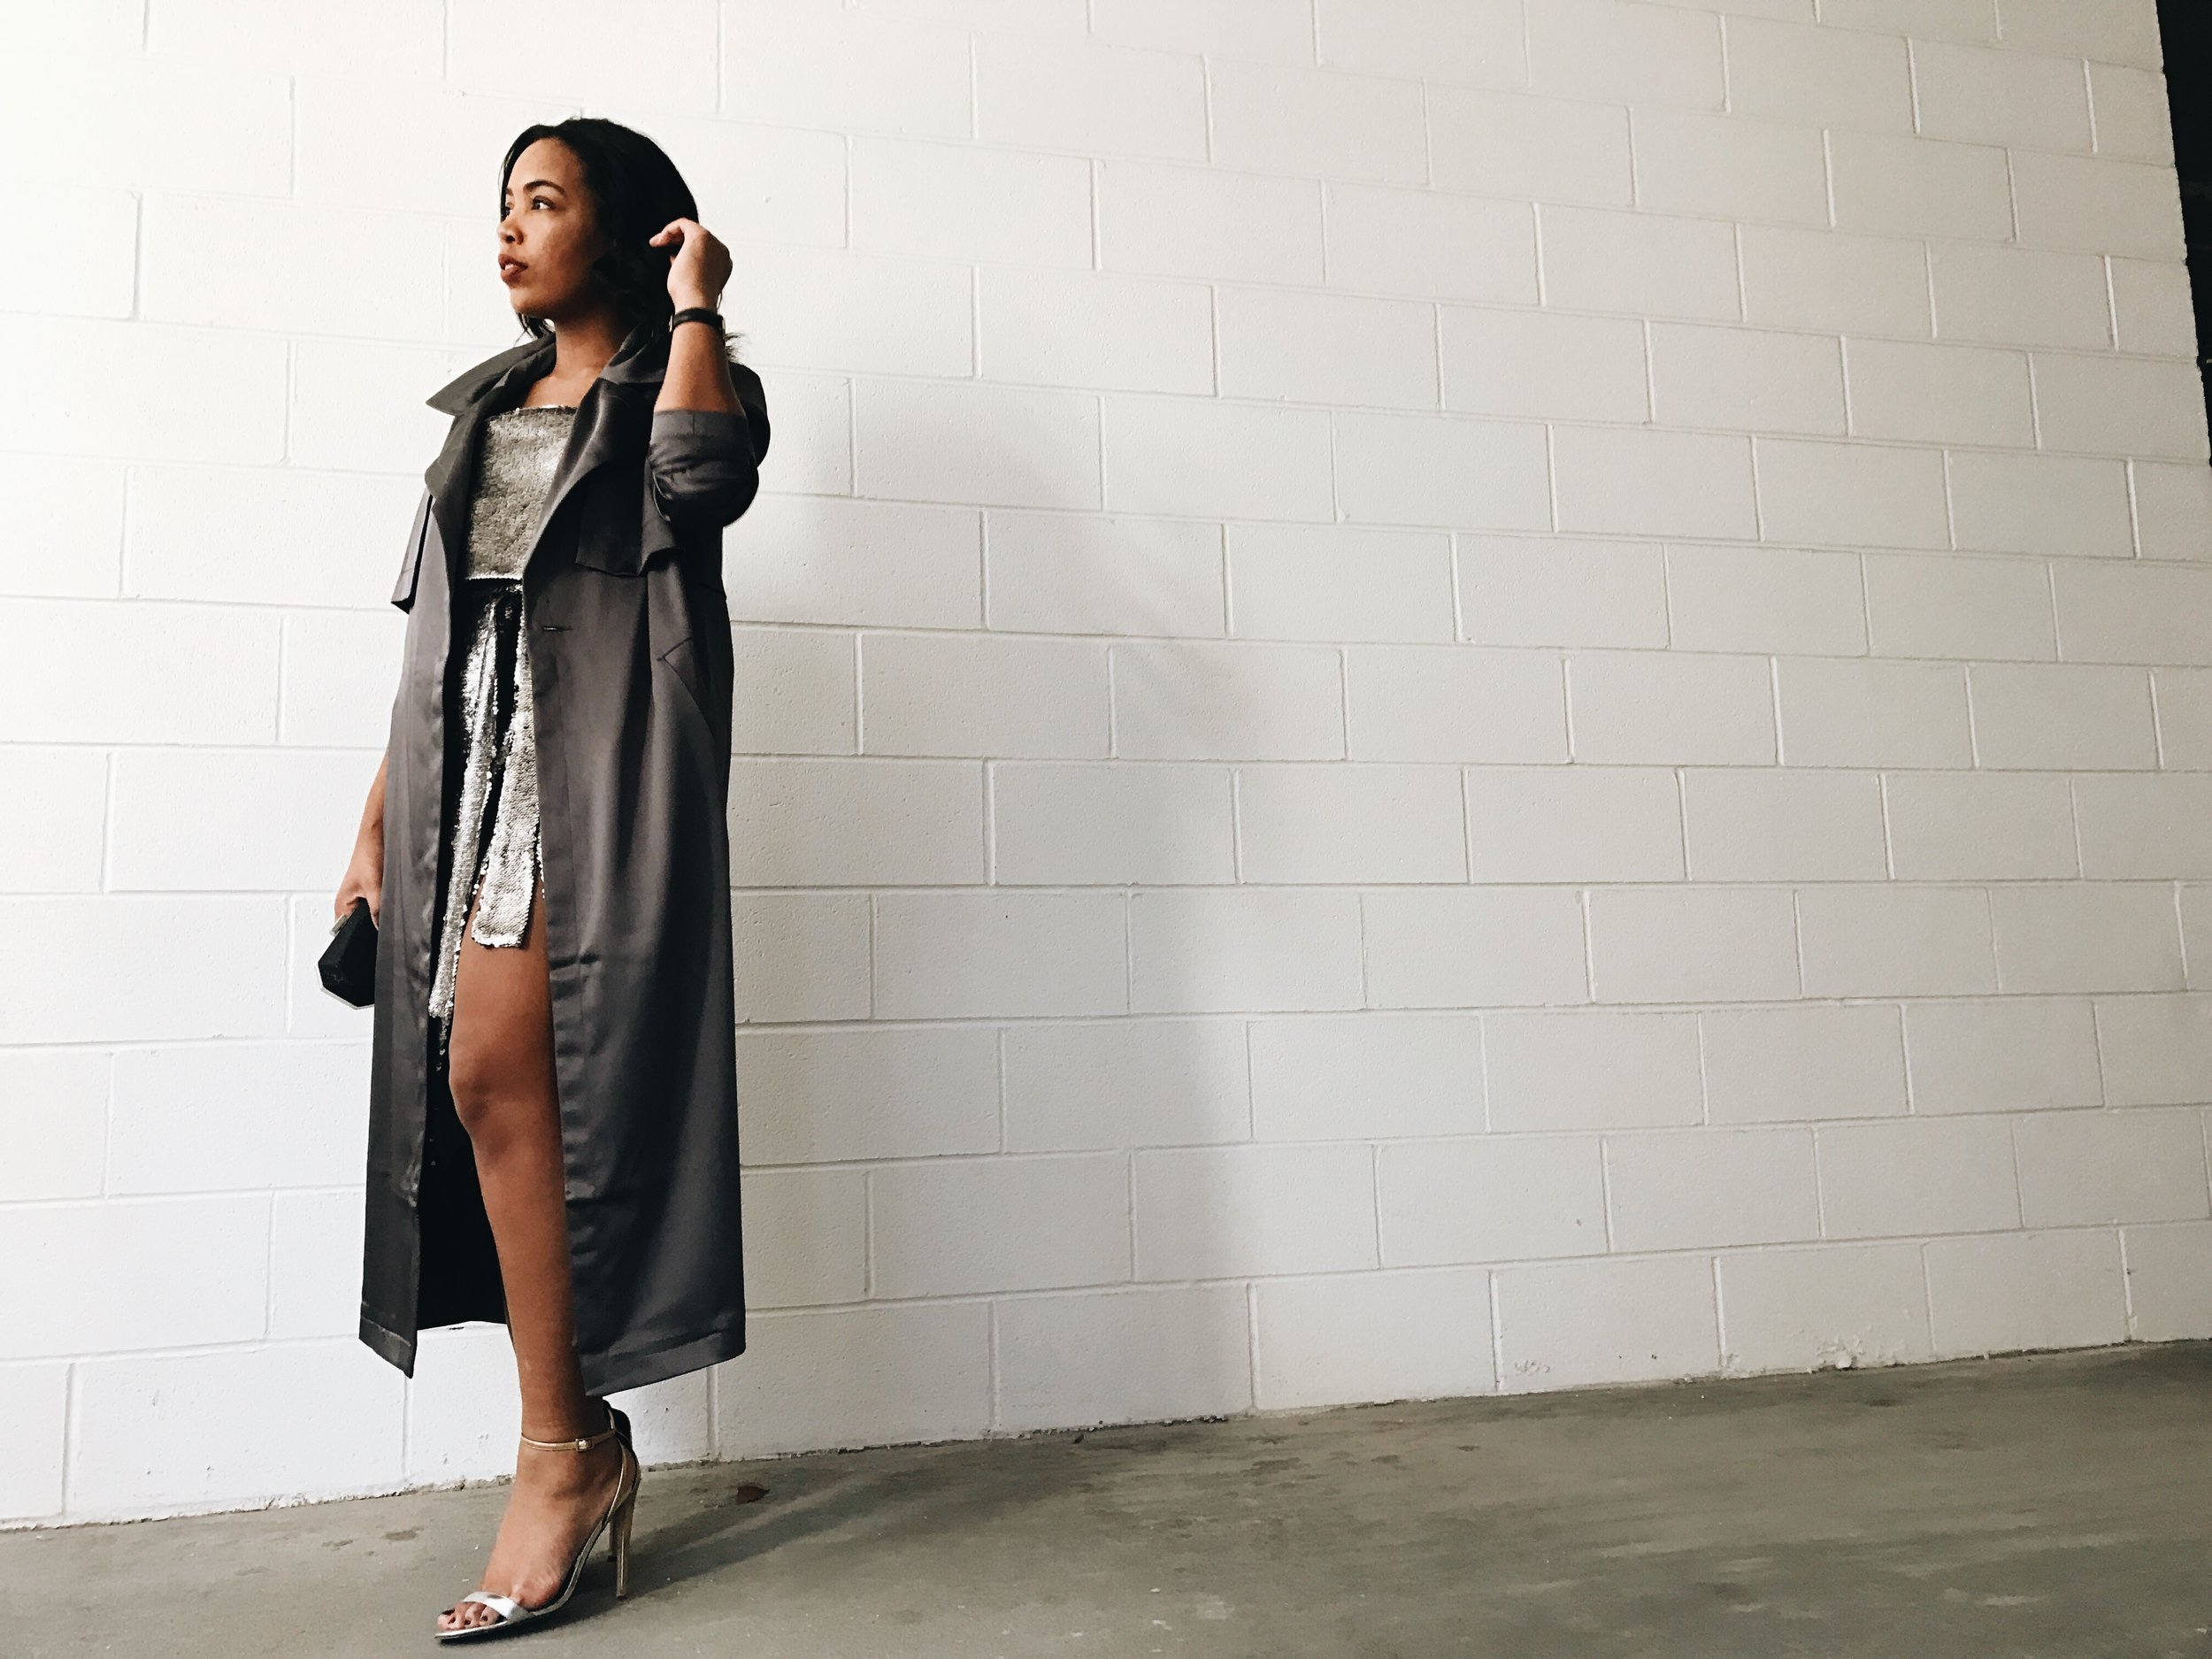 Lavish-Alice-Sequin-Dress-ASOS-Satin-Trench-Coat-Metallic-Heels-NYE-outfit.jpg